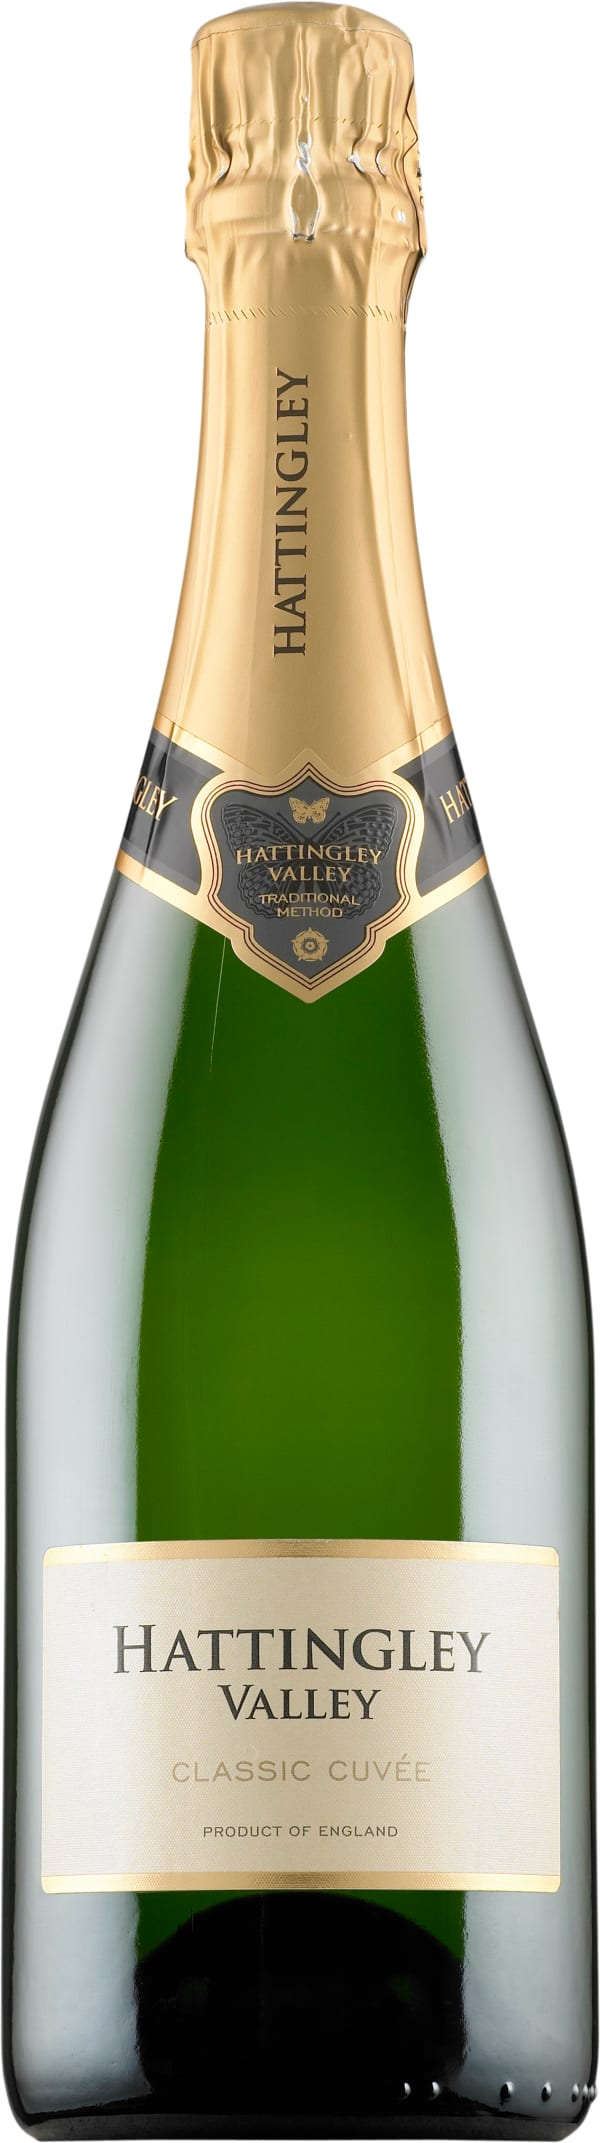 Hattingley Valley Classic Cuvée Brut